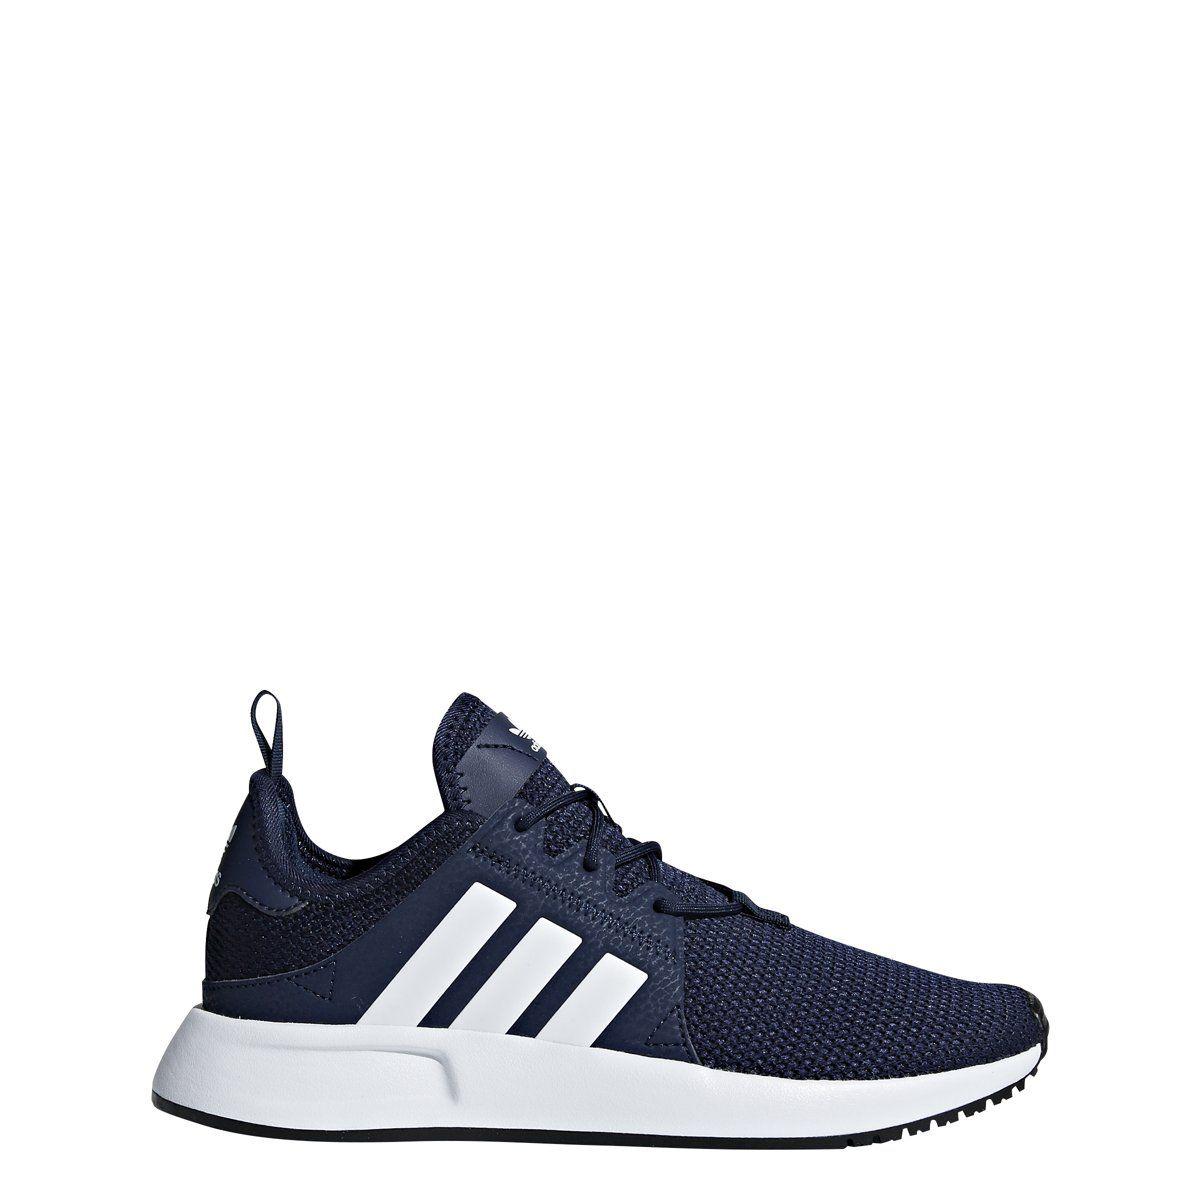 ADIDAS X_PLR KIDS SNEAKERS | Adidas